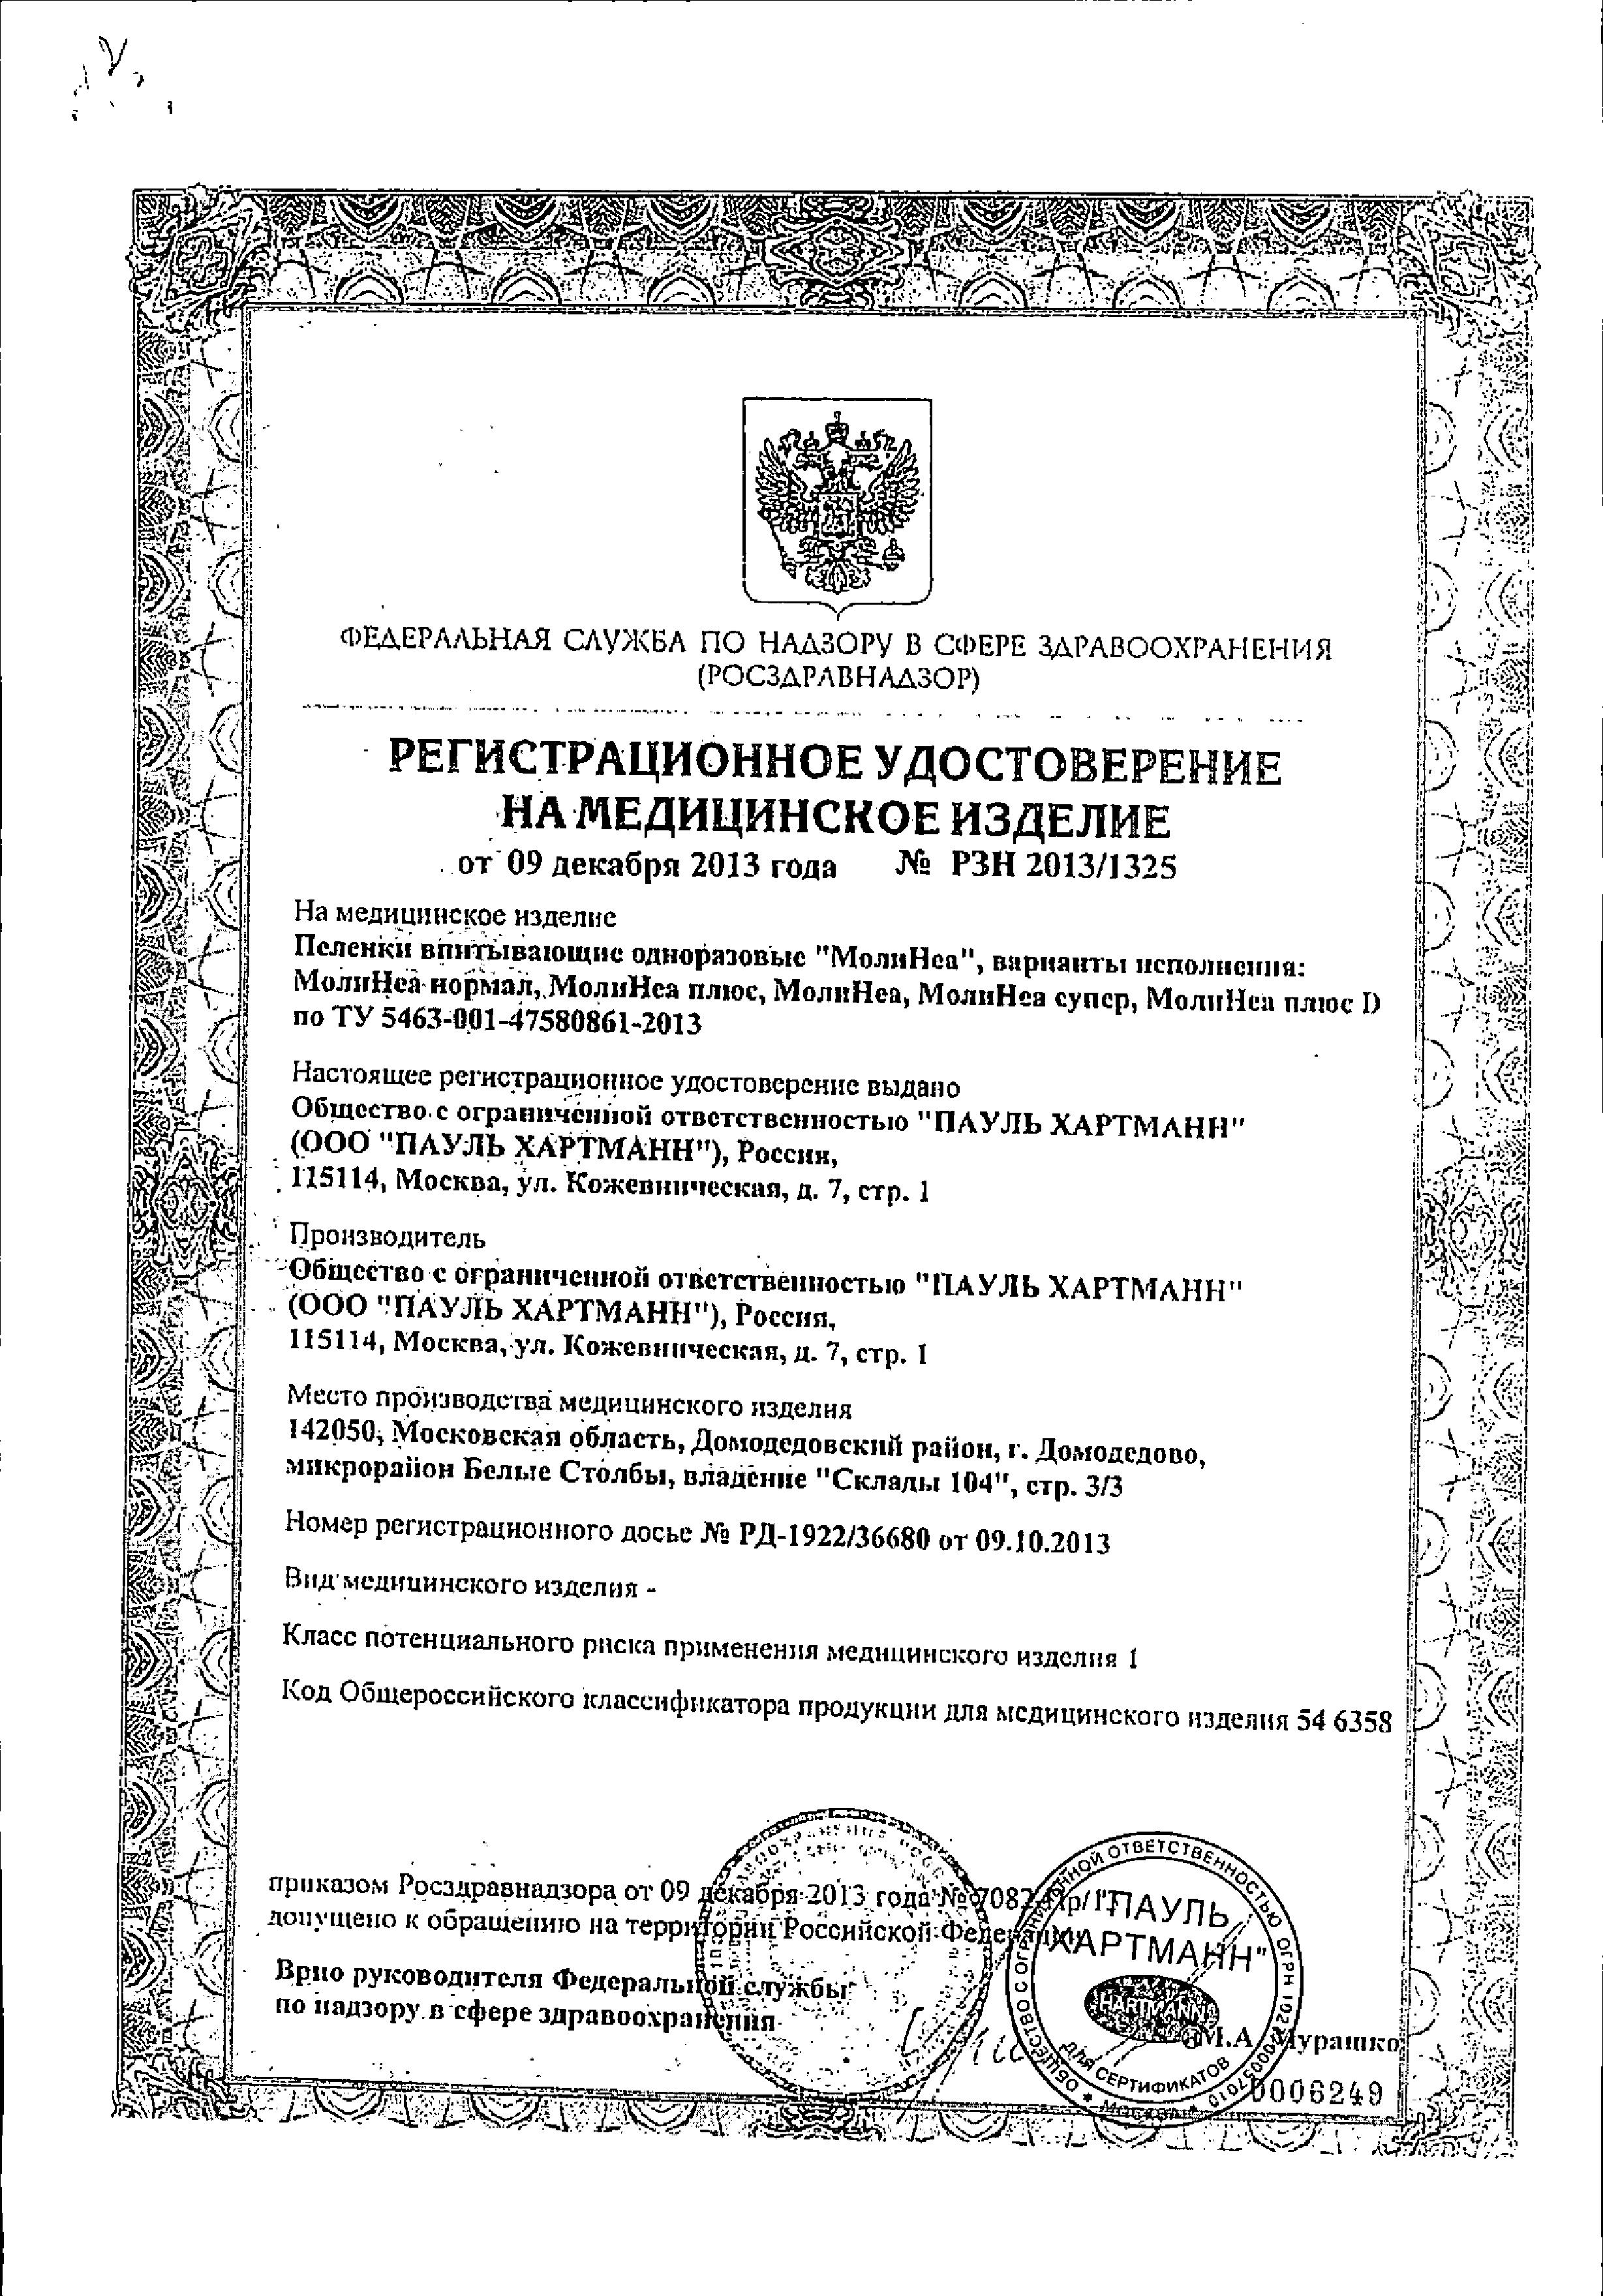 Hartmann Molinea Normal Пеленки впитывающие сертификат